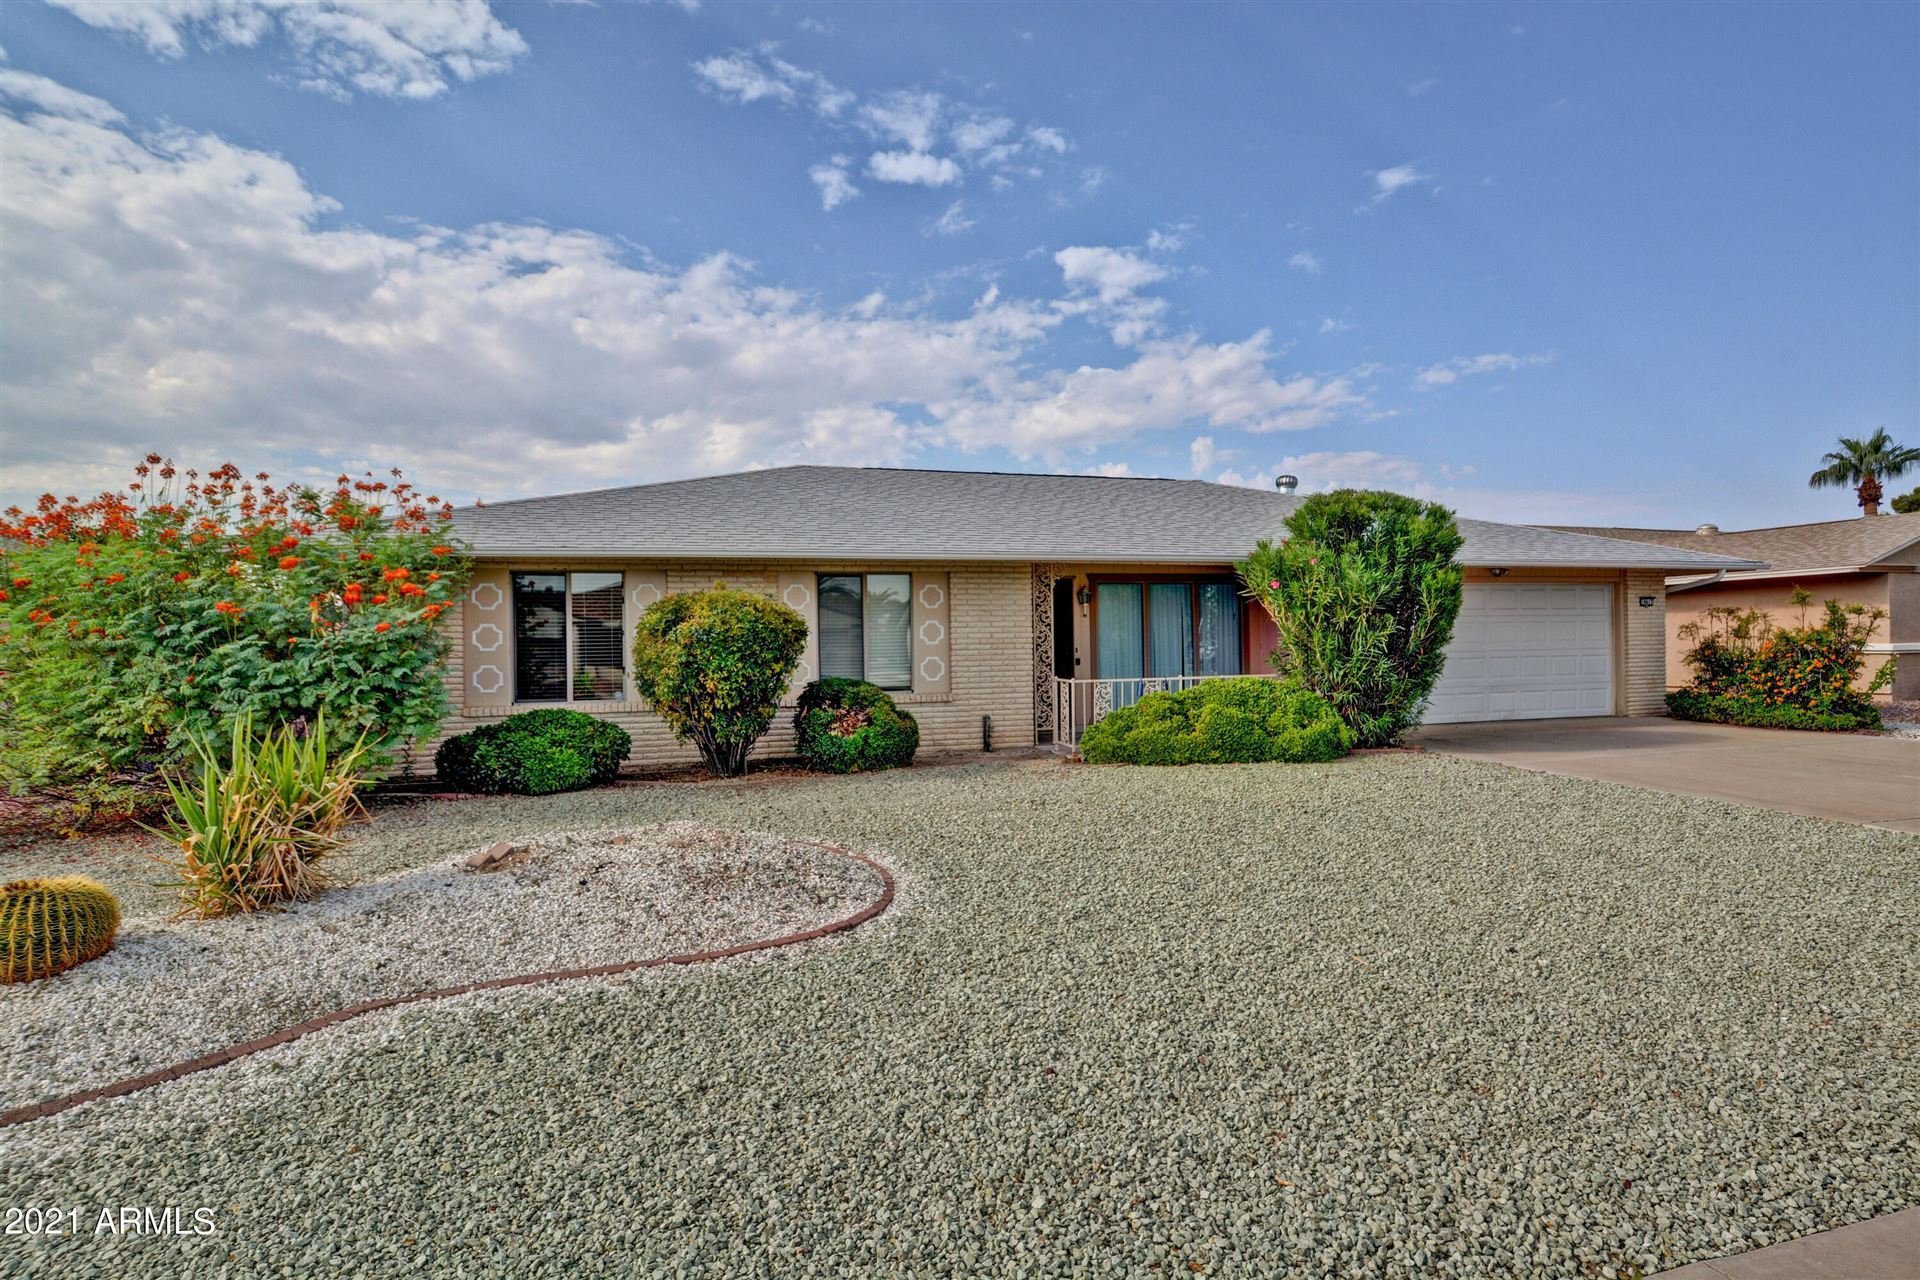 Photo of 10417 W BURNS Drive, Sun City, AZ 85351 (MLS # 6296103)